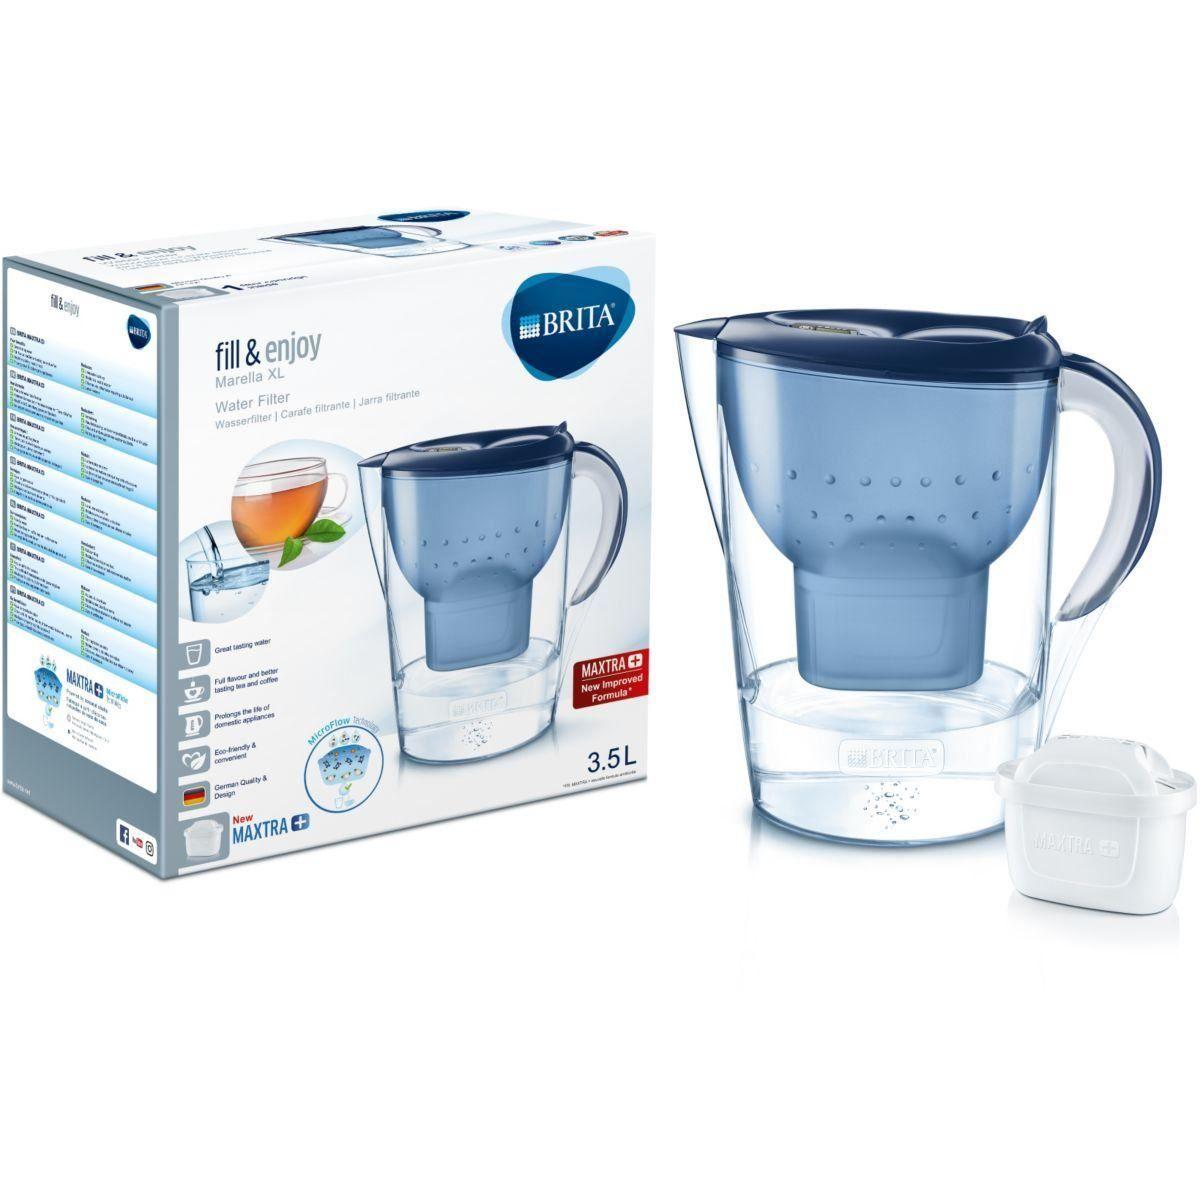 BRITA Marella XL Water Filter Jug and MAXTRA+ Cartridge, Blue or White - £13.05 @ ozaroo-uk / eBay